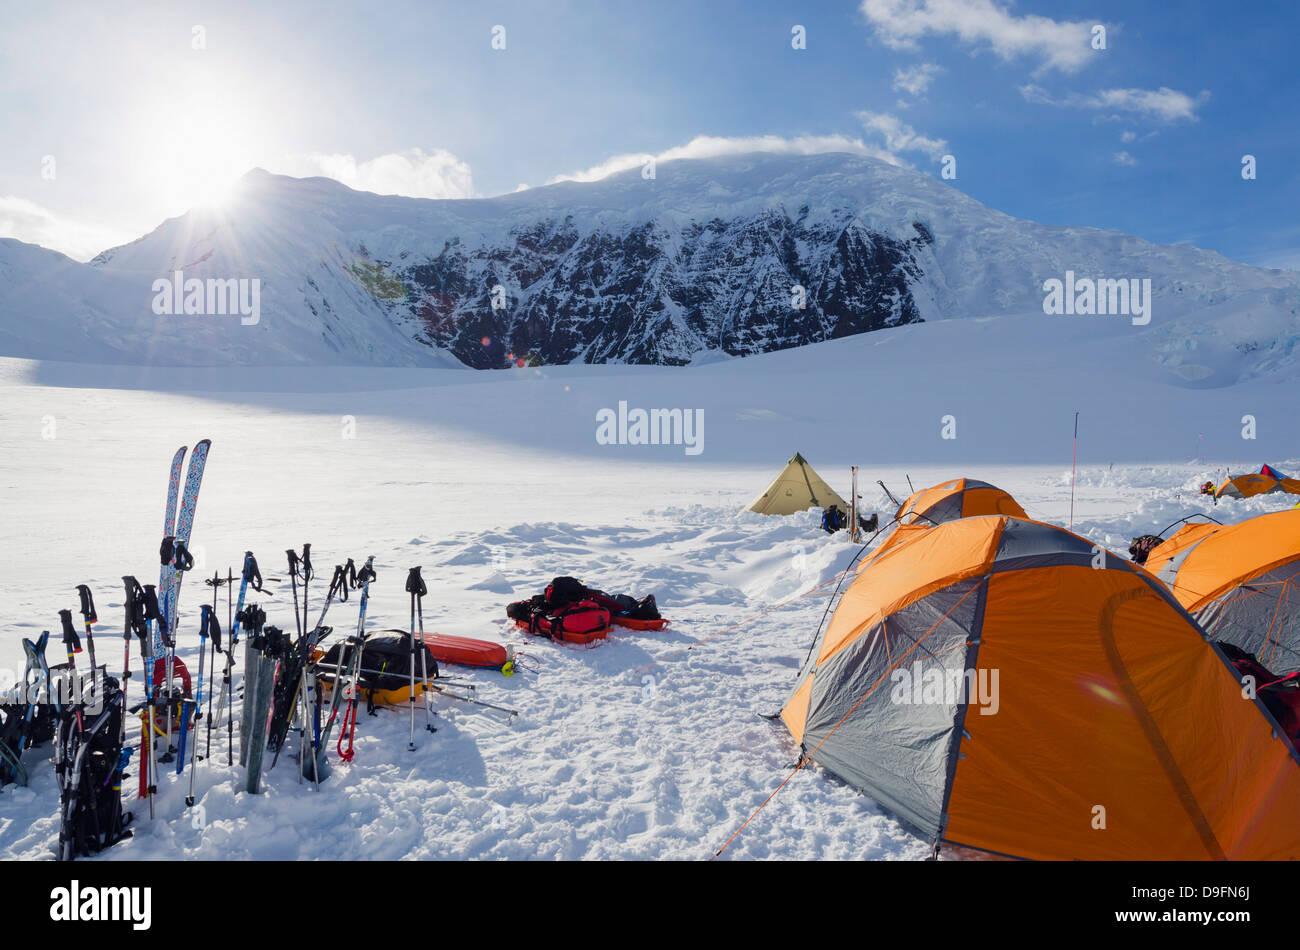 Camp 1, Klettern Expedition auf den Mount McKinley, 6194m, Denali National Park, Alaska, USA Stockbild